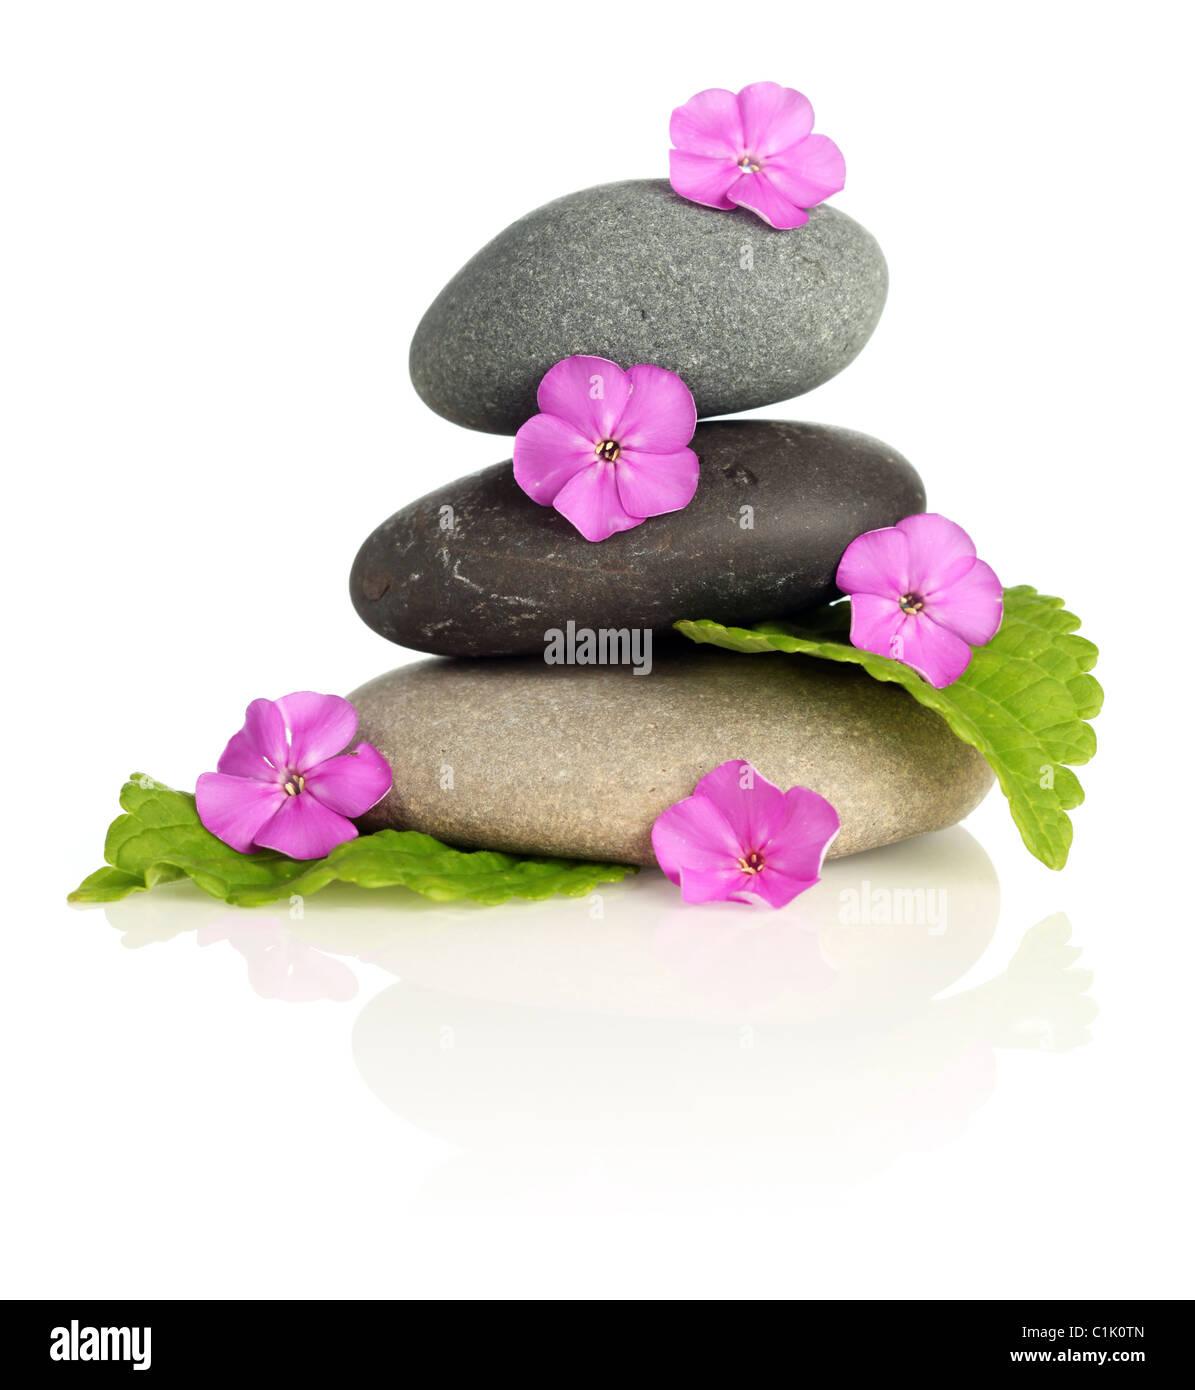 Piedras apiladas con flores. Imagen De Stock